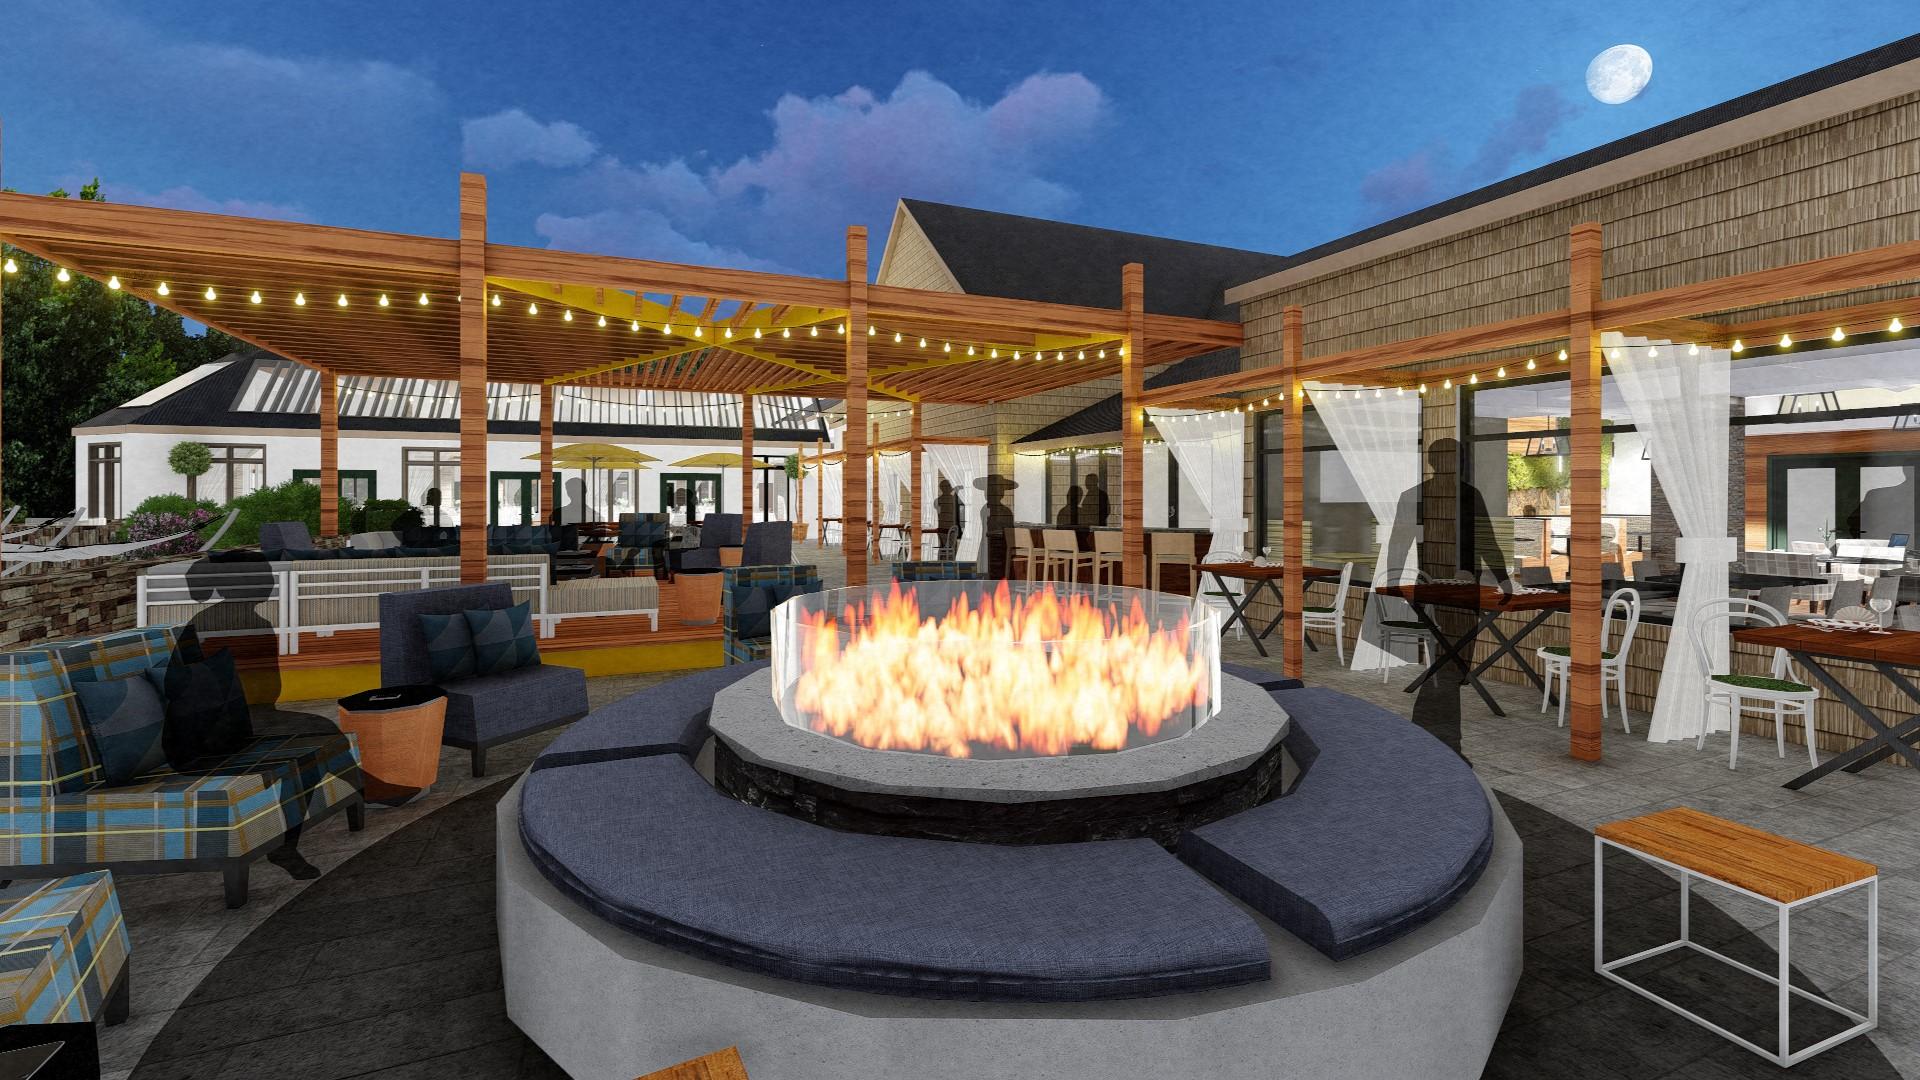 14 - Restaurant Terrace Fireplace.jpg